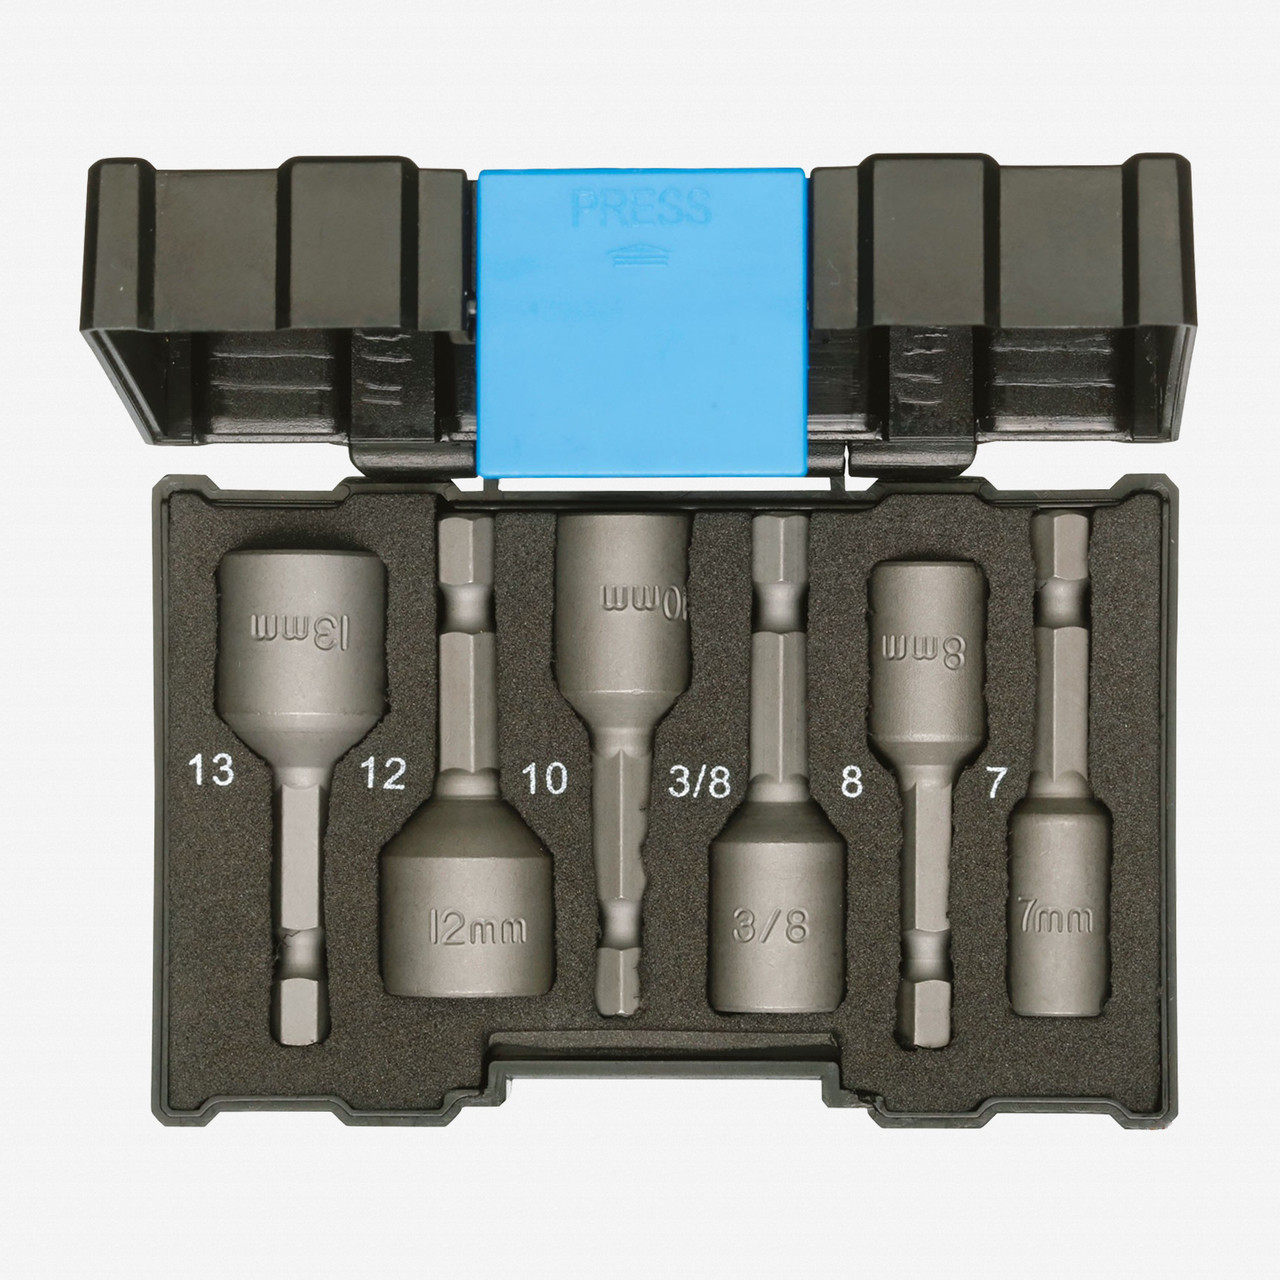 Gedore 666-006 Bit Box Nut Setter Set - KC Tool